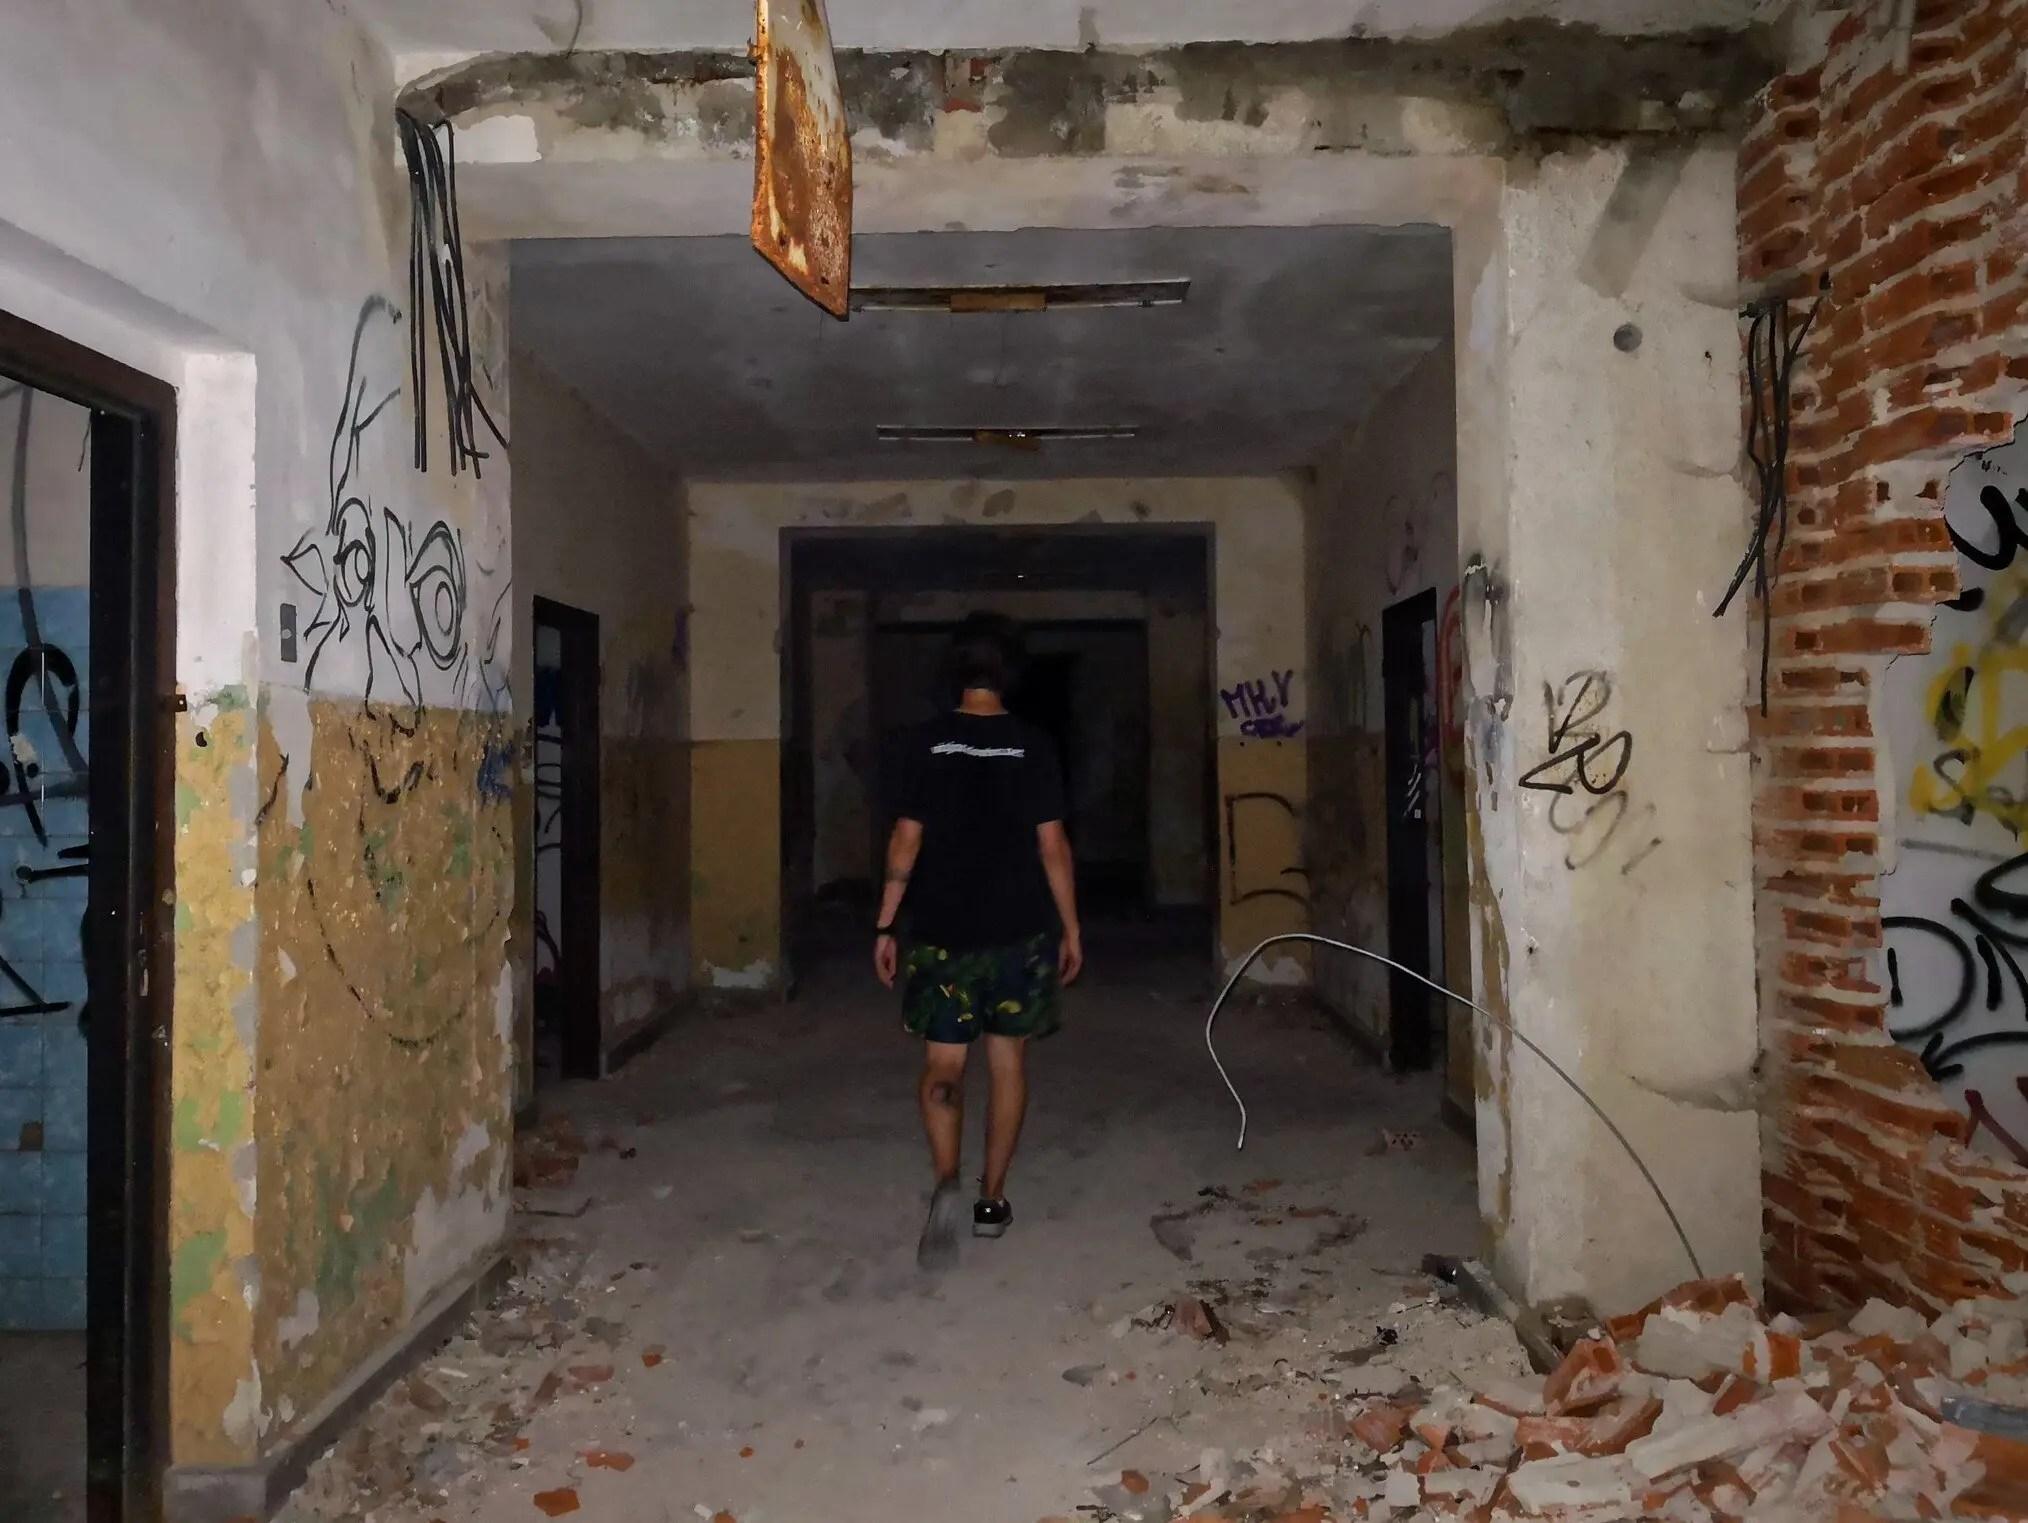 Caminando por edificio abandonado en Bratislava